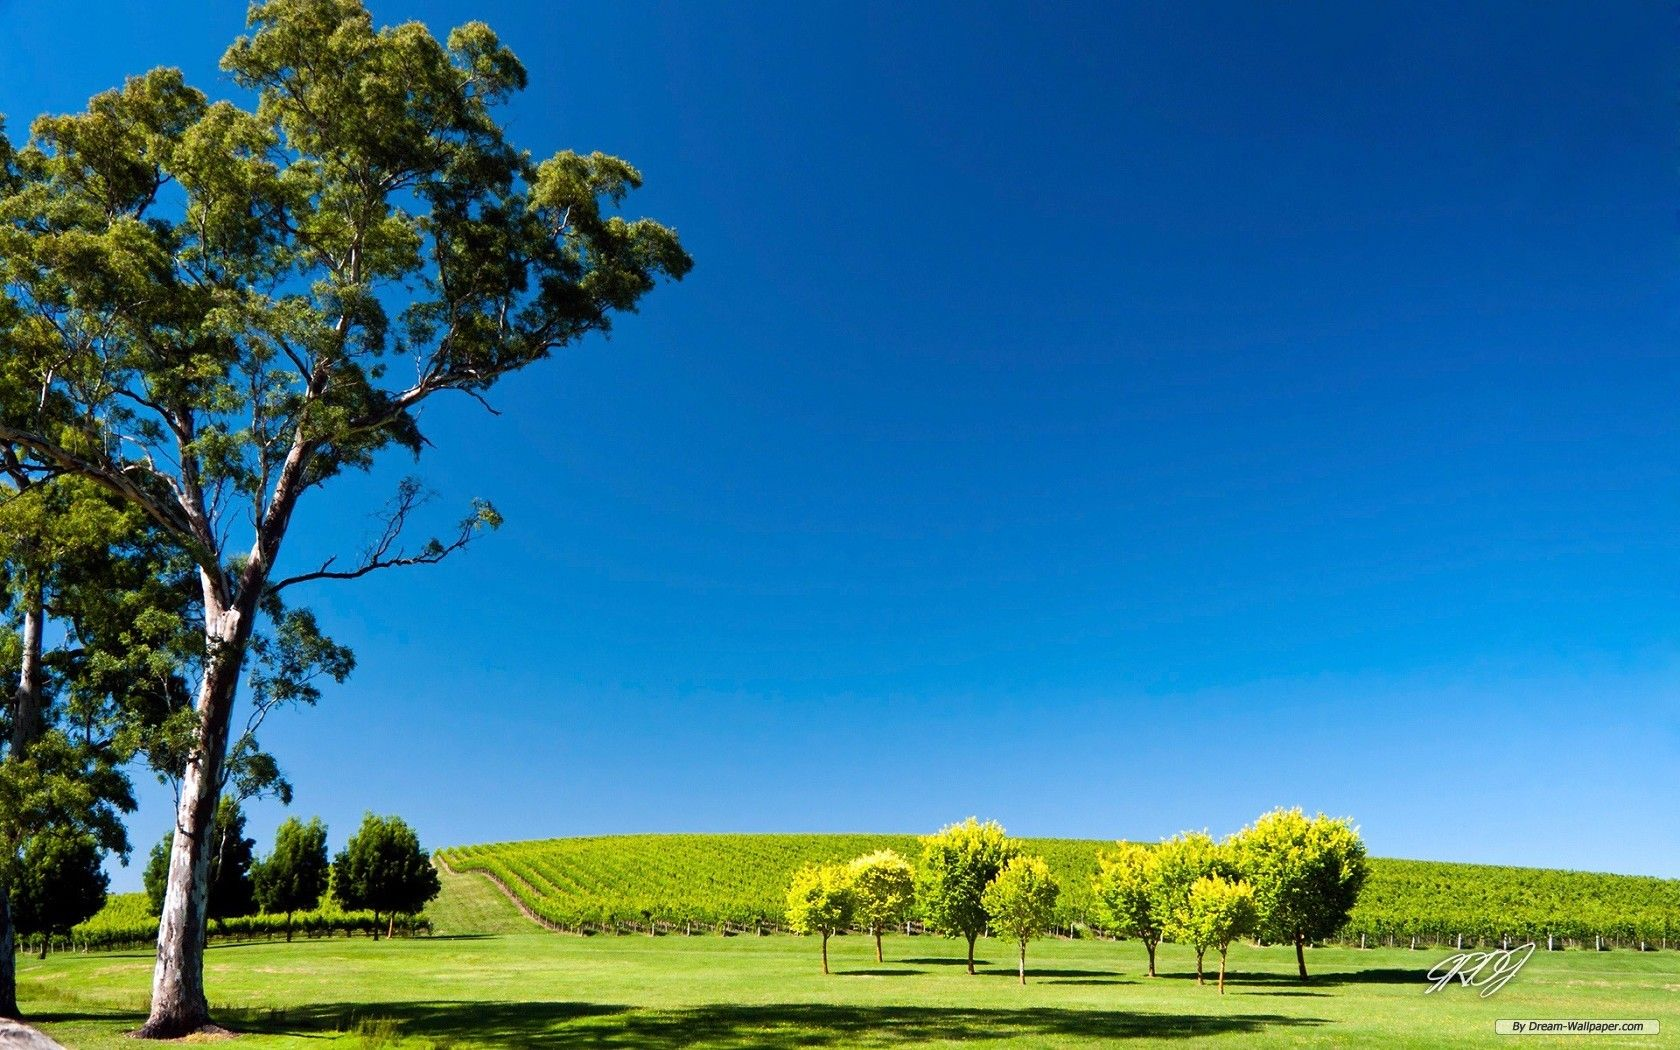 Australia Scenery Wallpapers Top Free Australia Scenery